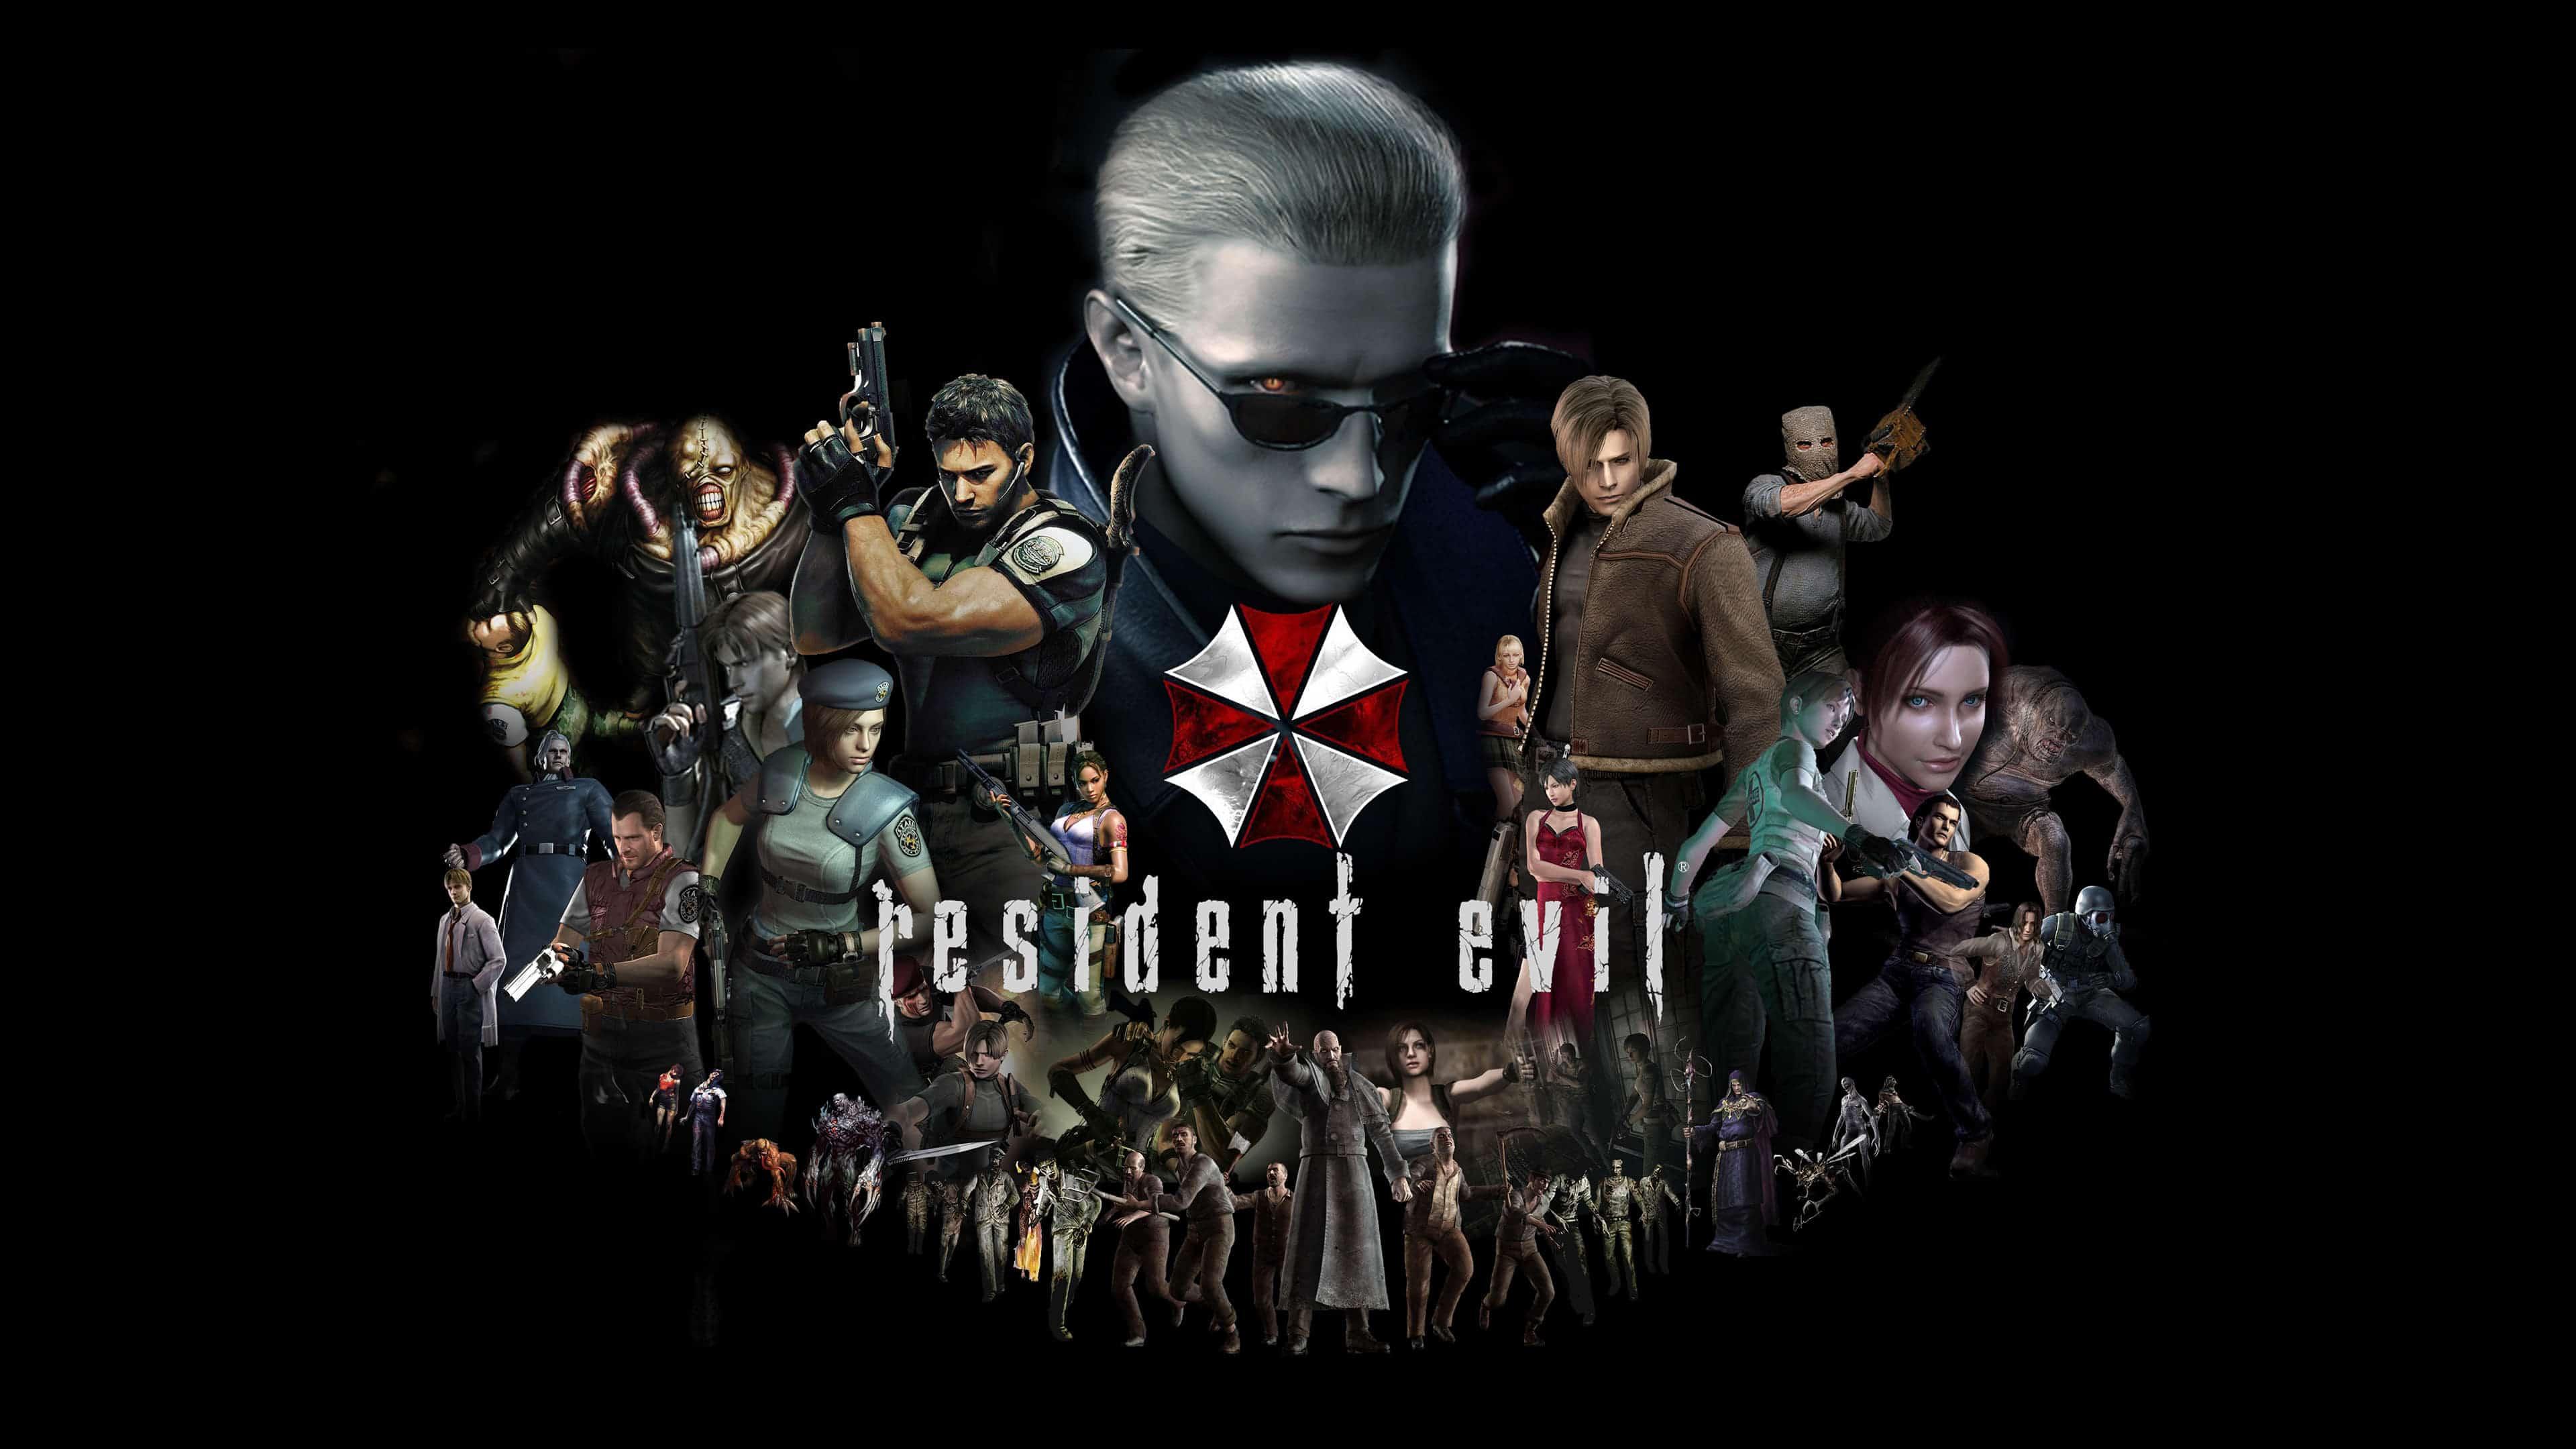 Resident Evil Characters Uhd 4k Wallpaper Pixelz